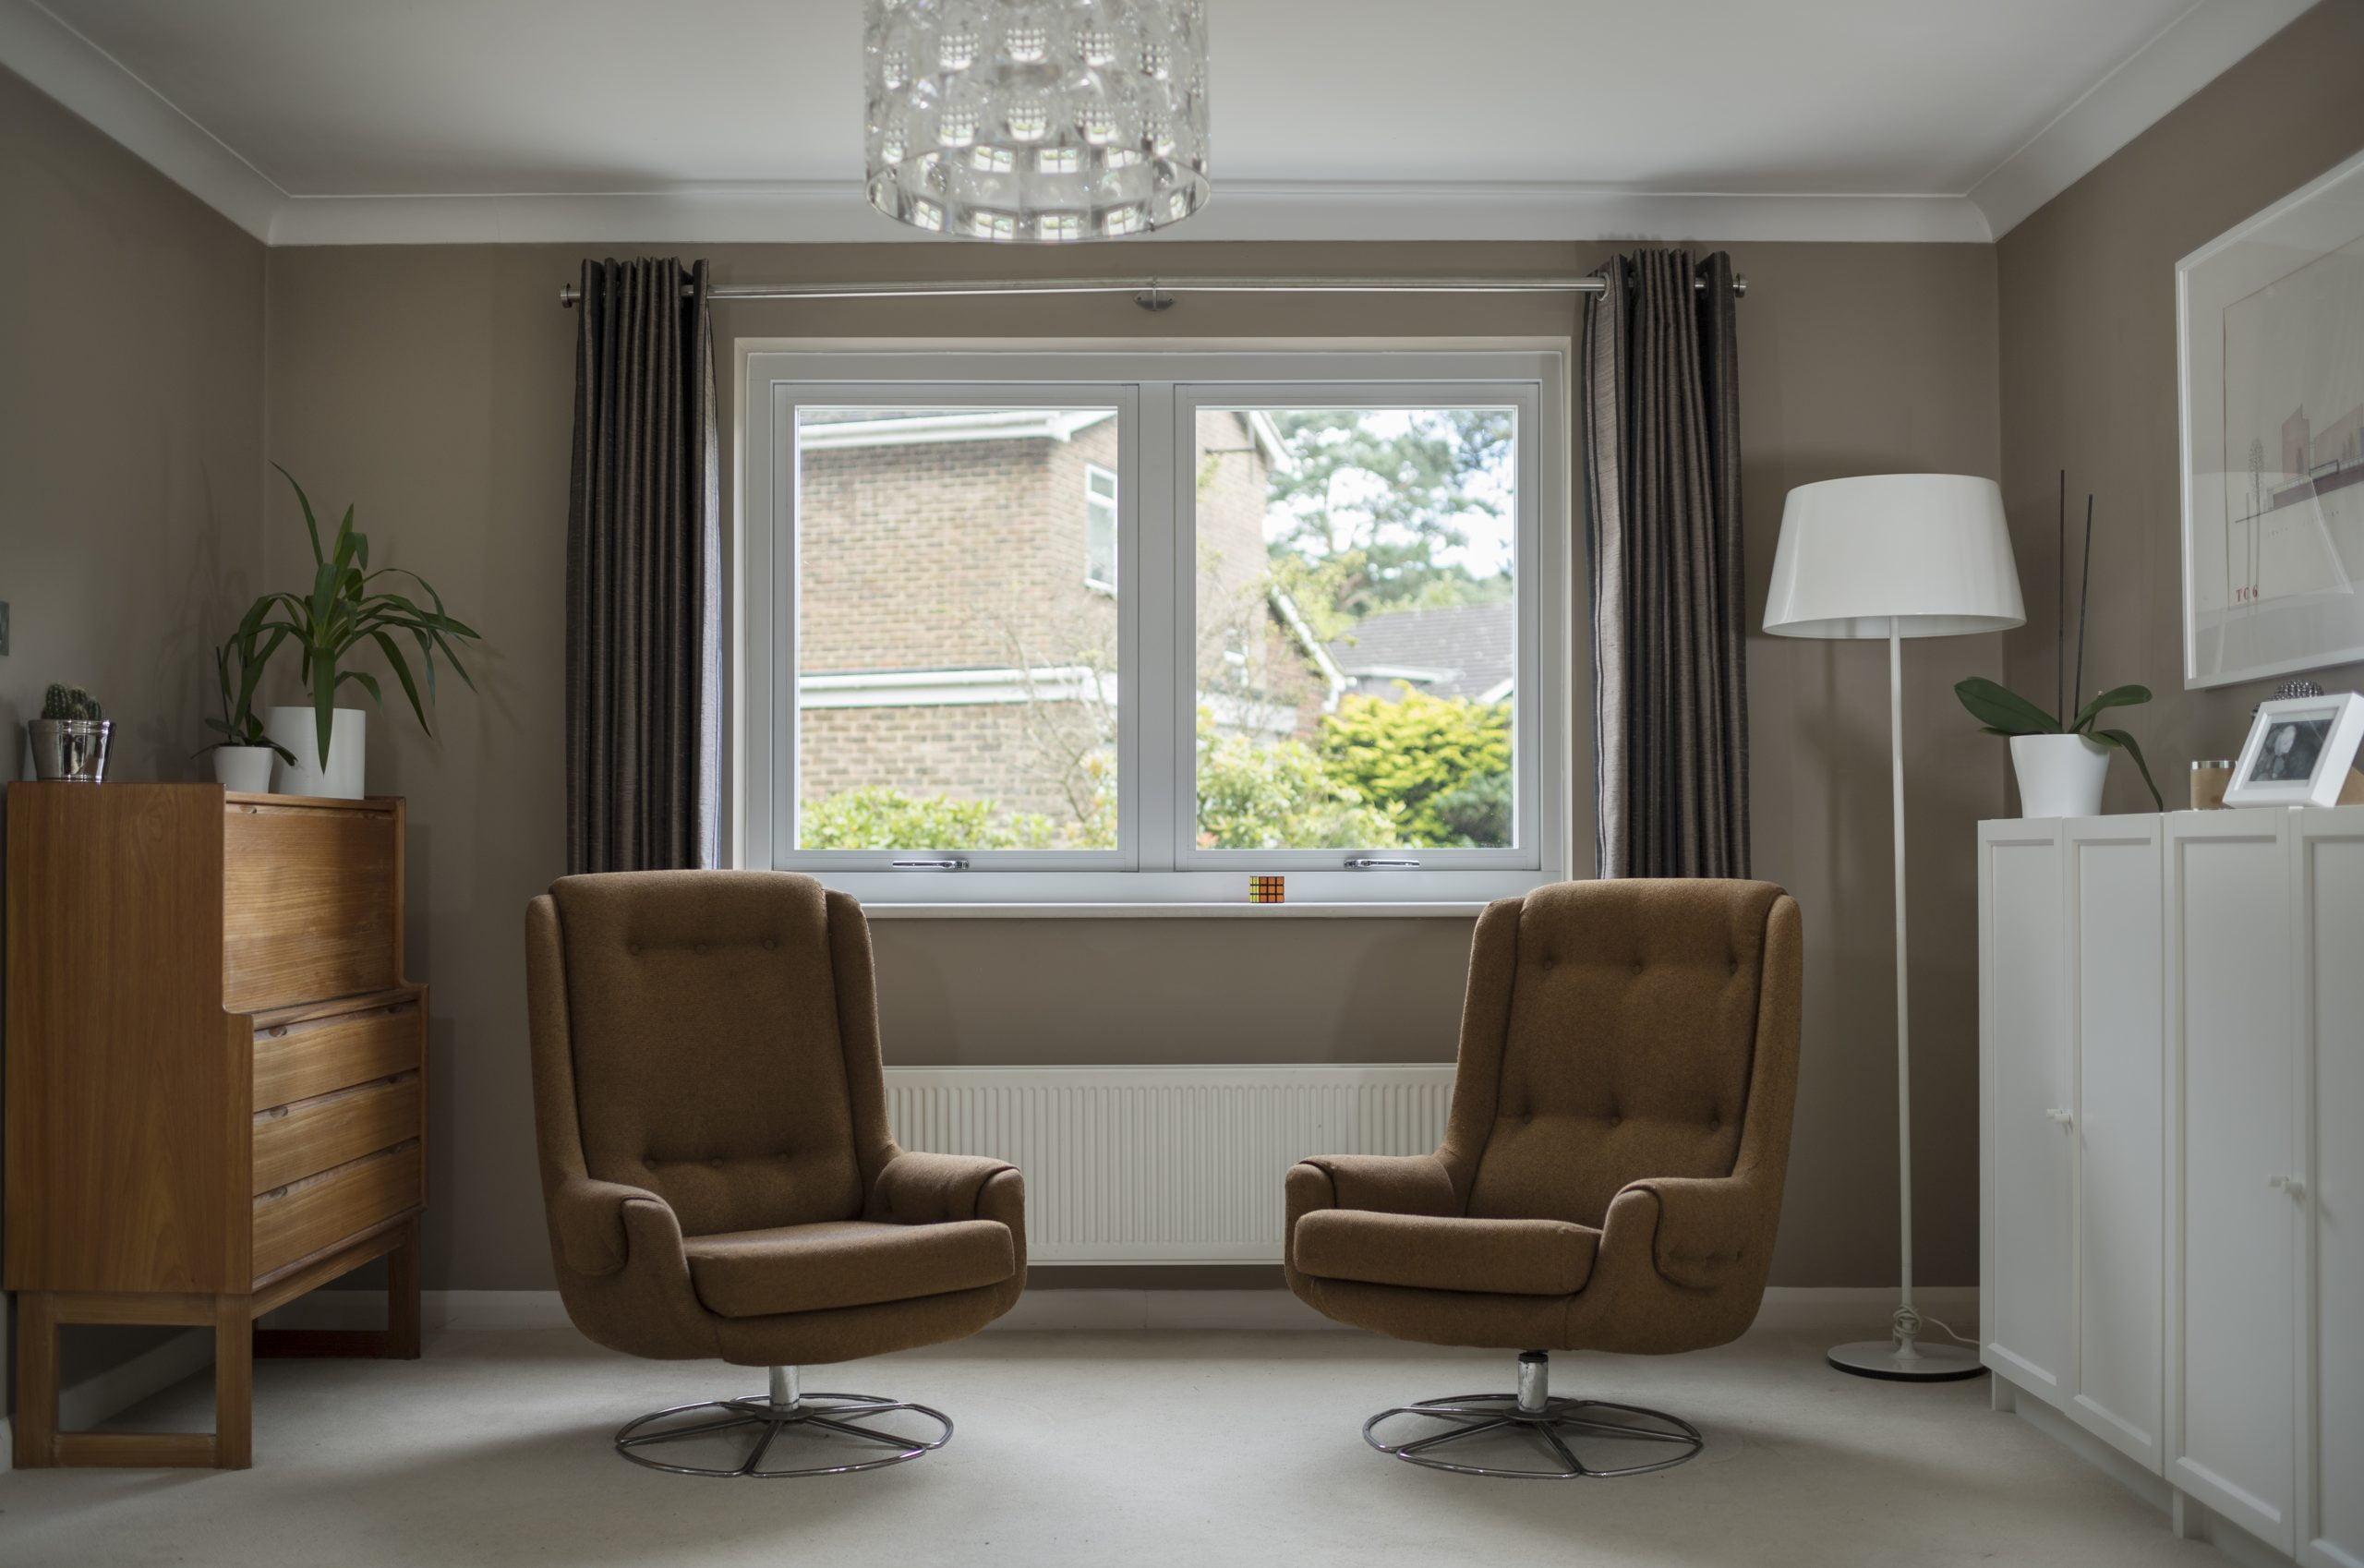 Residence 2 windows by Wharfedale Windows